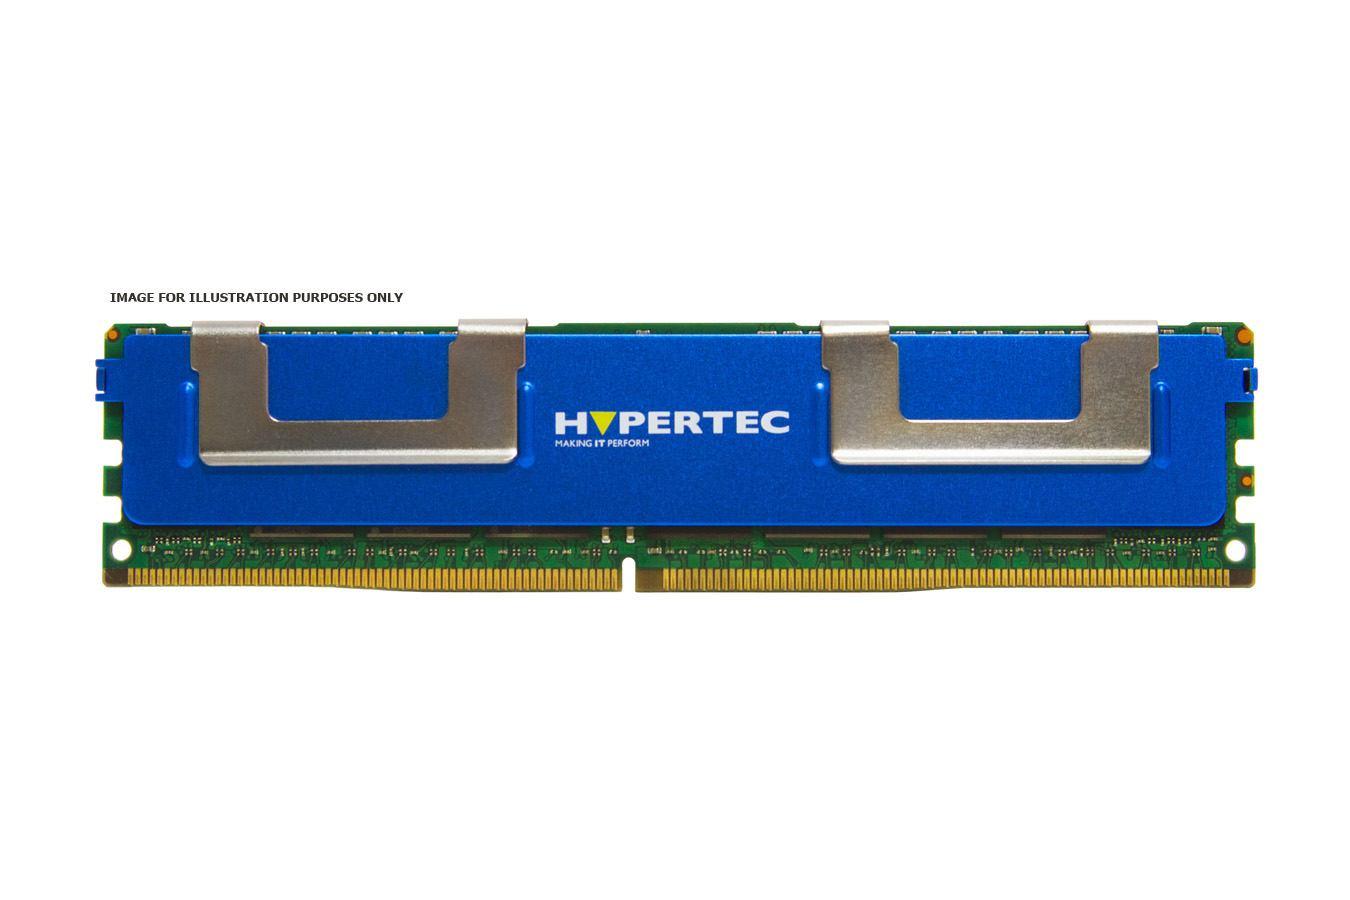 2022026-Hypertec-HYMDL8916G-LV-memoria-16-GB-DDR3-1333-MHz-Data-Integrity-Check